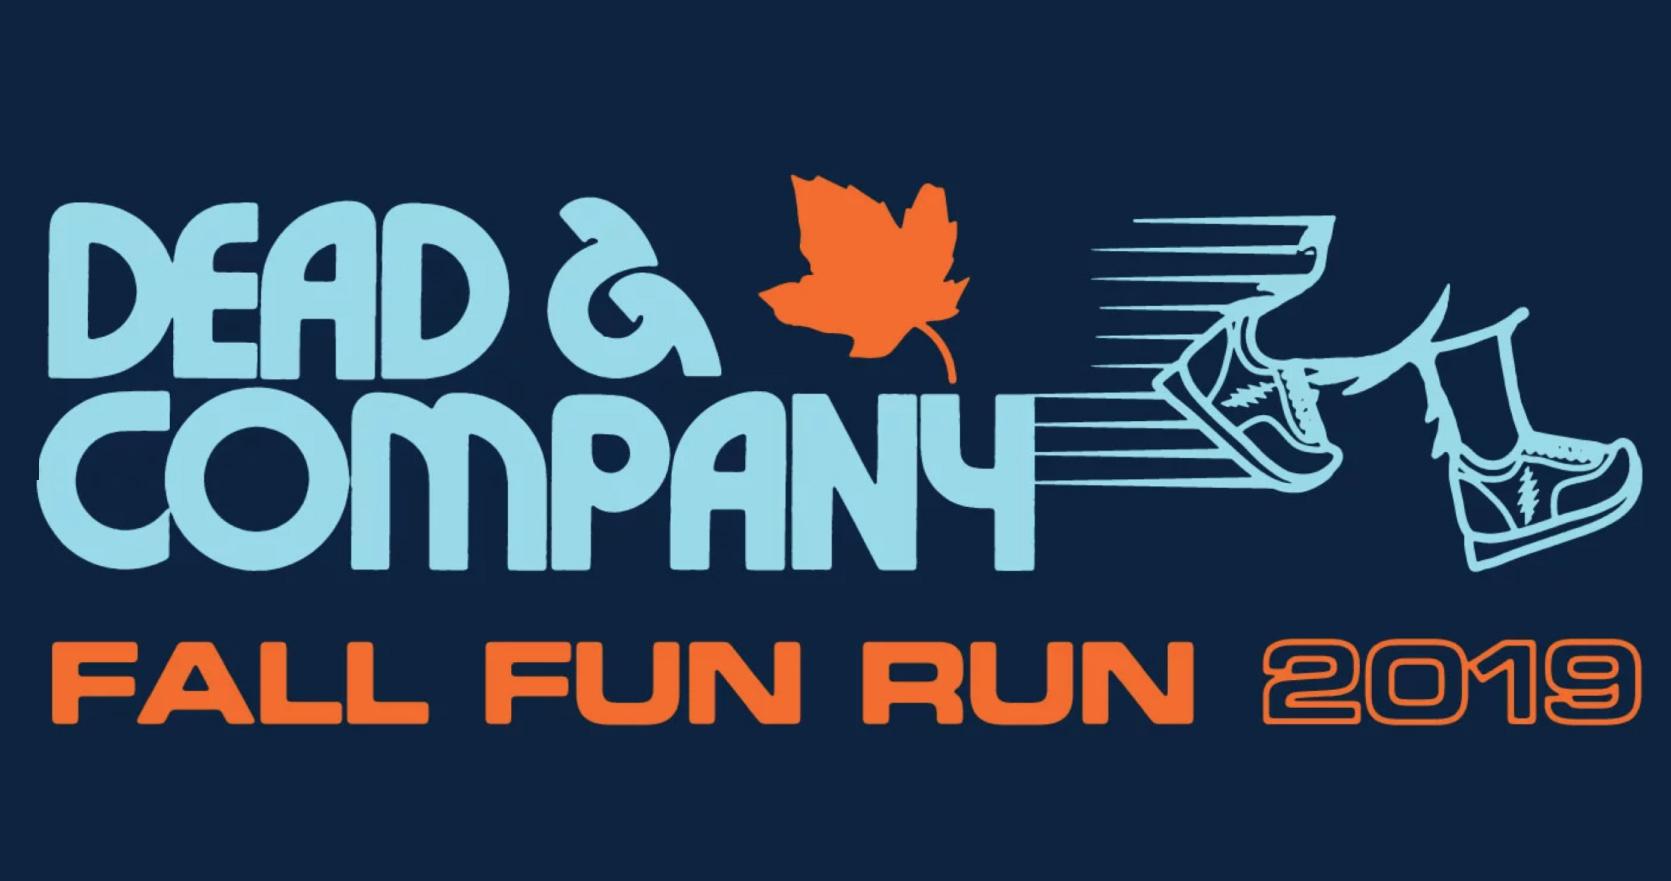 Dead & Company Announces 2019 'Fall Fun Run' Webcasts